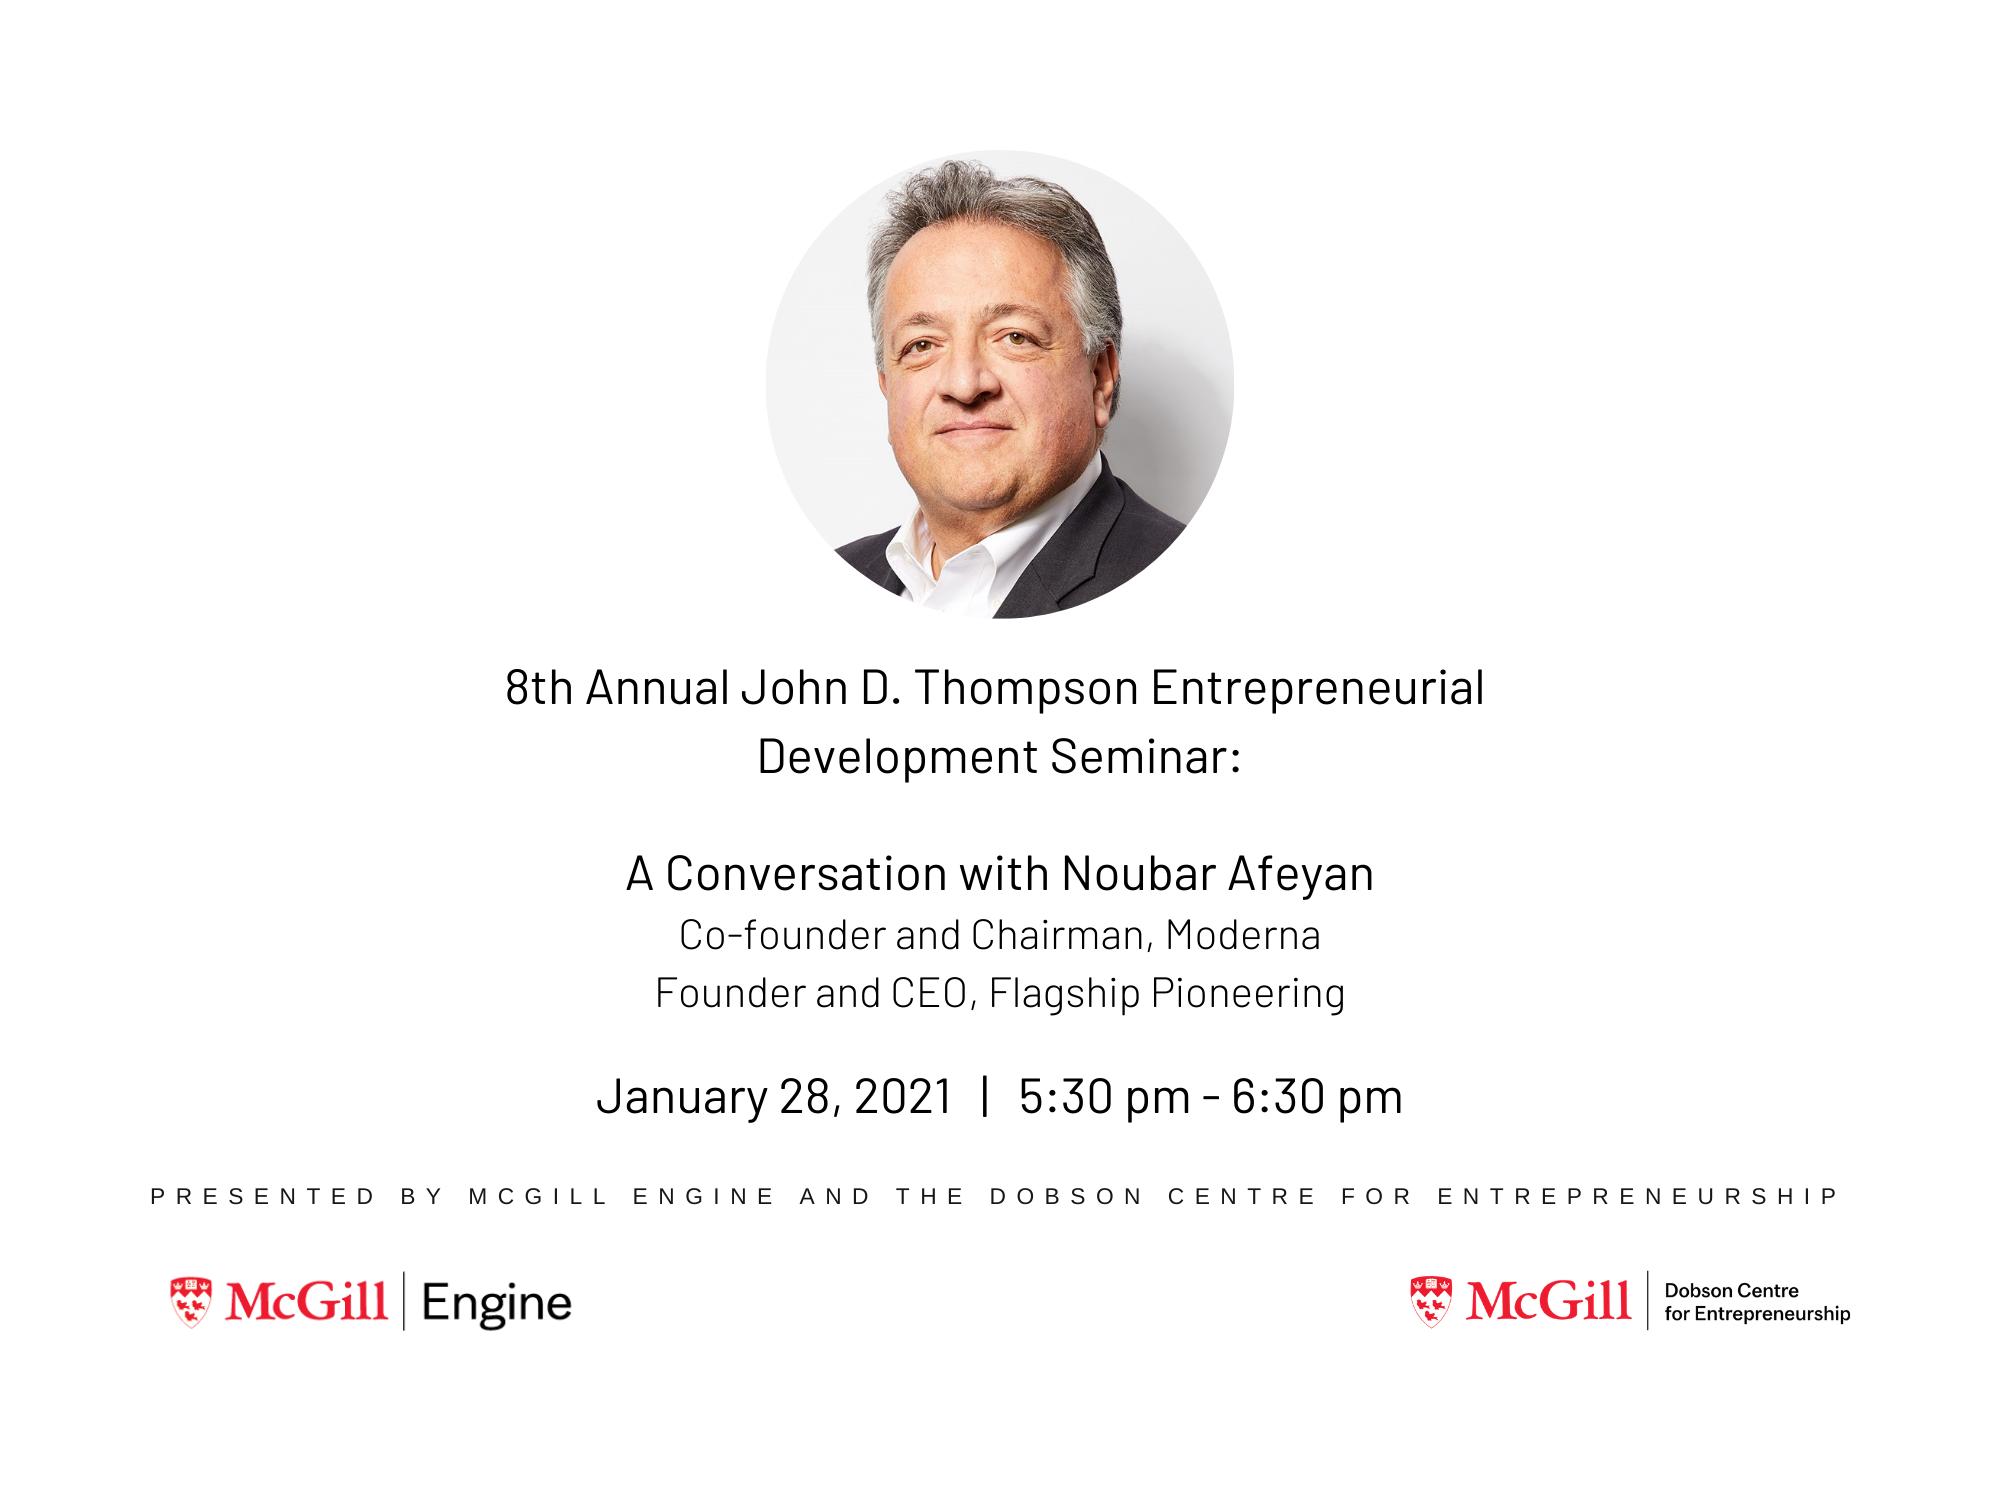 8th Annual John D. Thompson Entrepreneurial Development Seminar